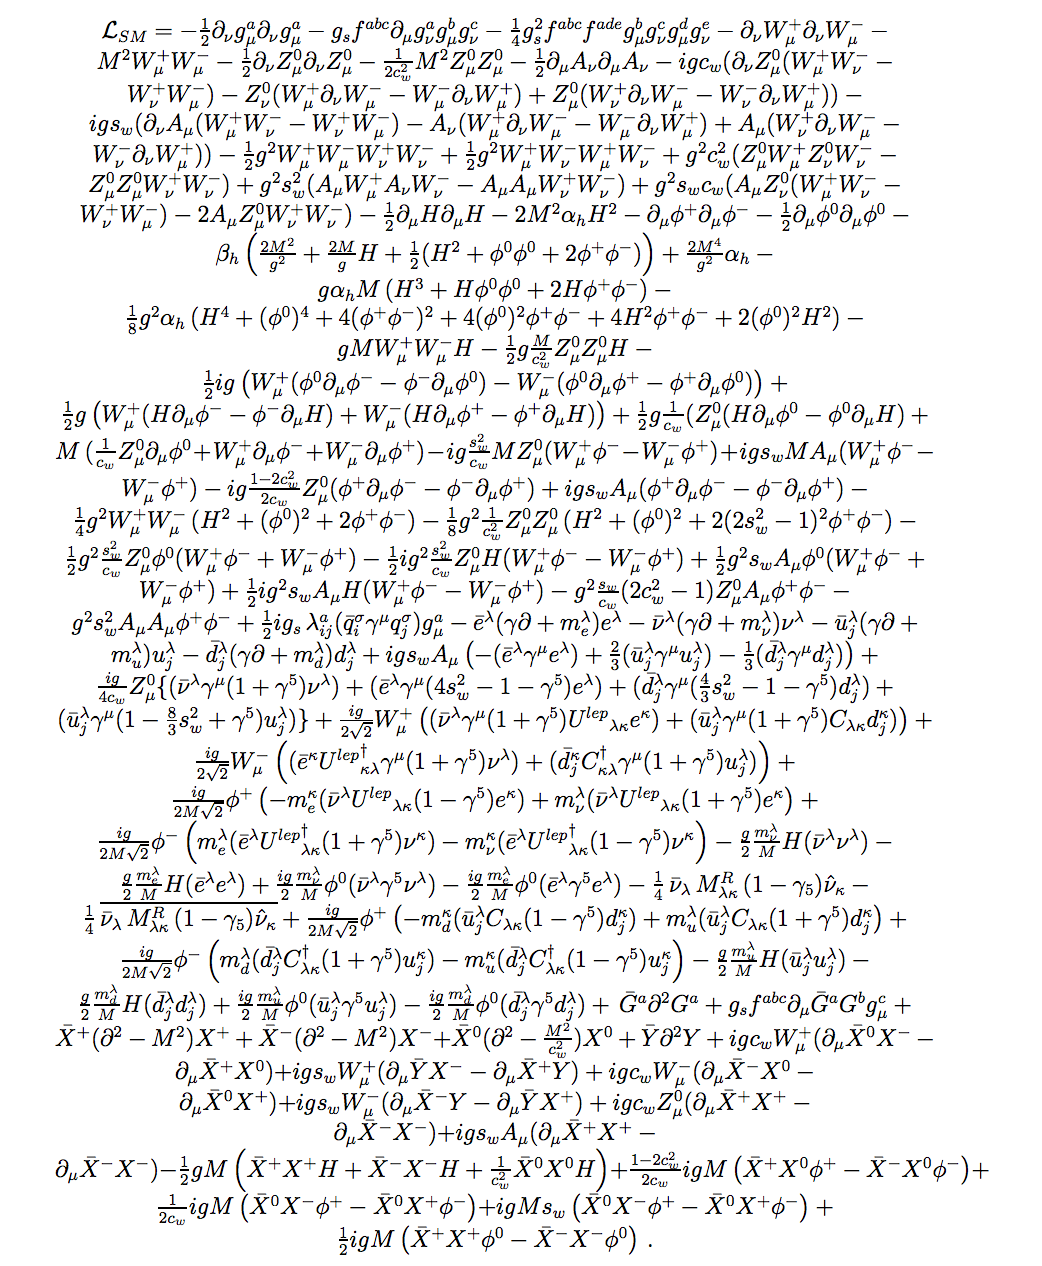 #math #standardmodellagrangian